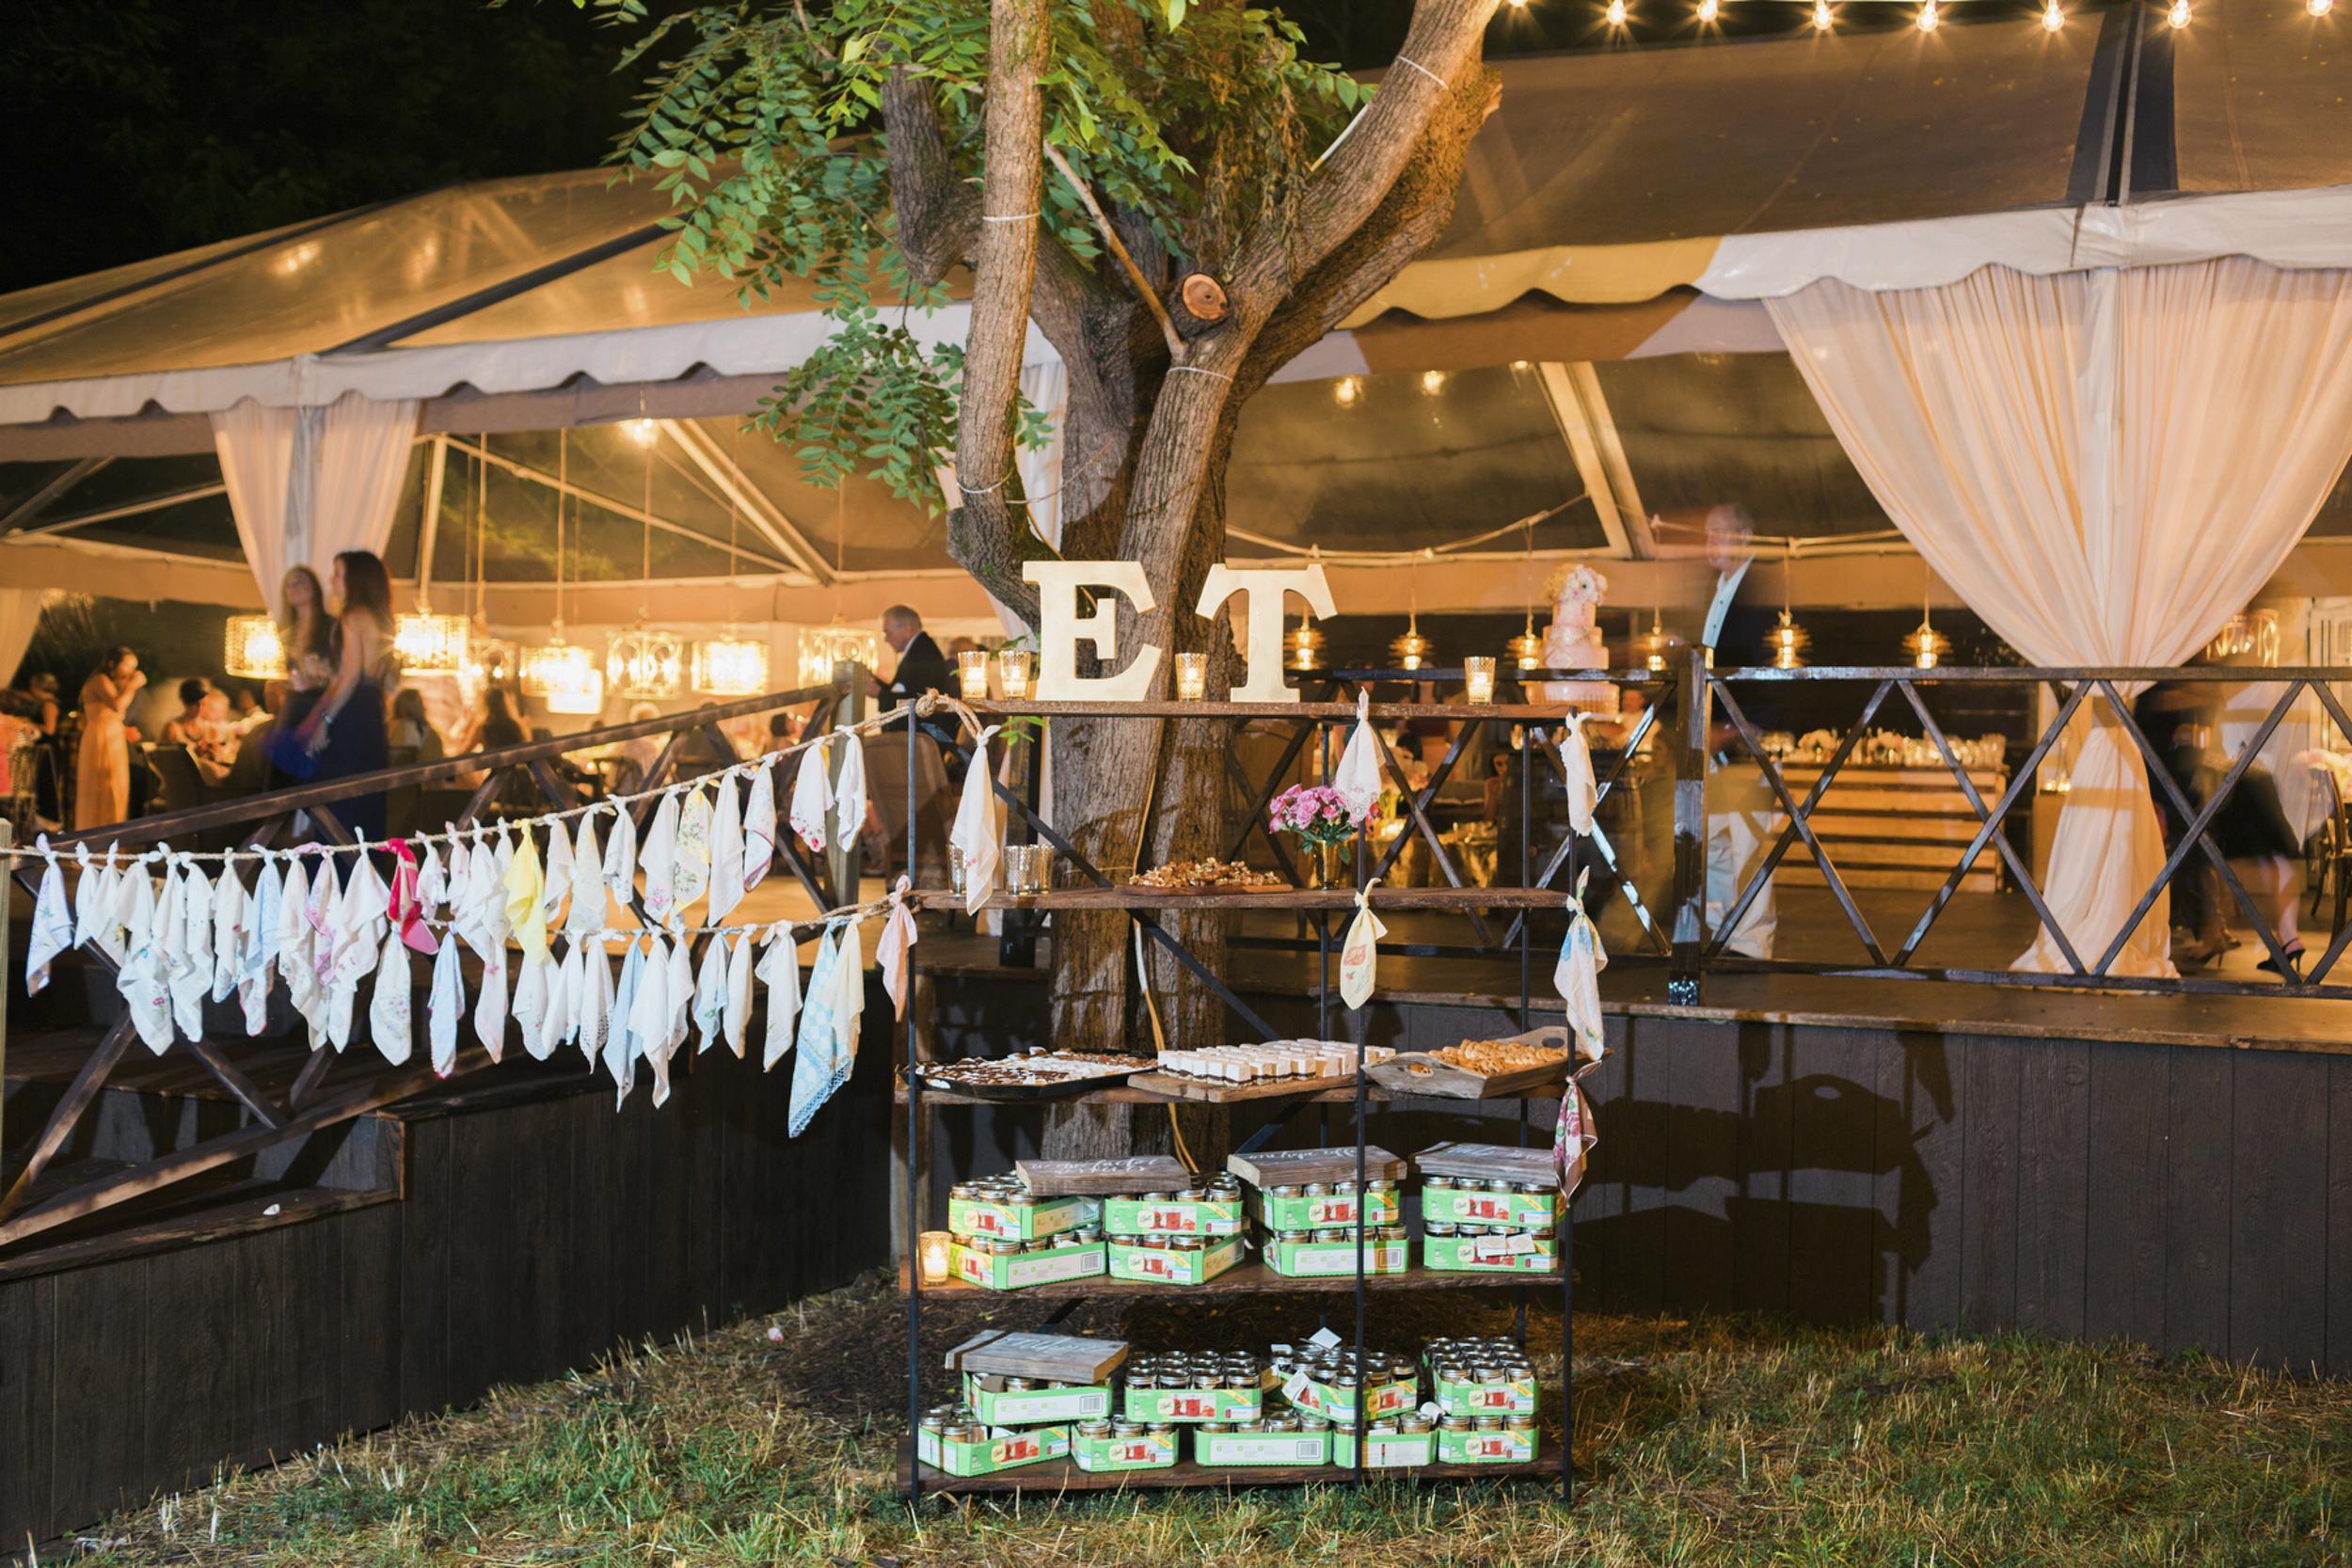 south_carolina_farm_wedding_rustic_chic_surprise_secret_luxe_wedding_bachelorette_emily_maynard_real_weddings-50.jpg